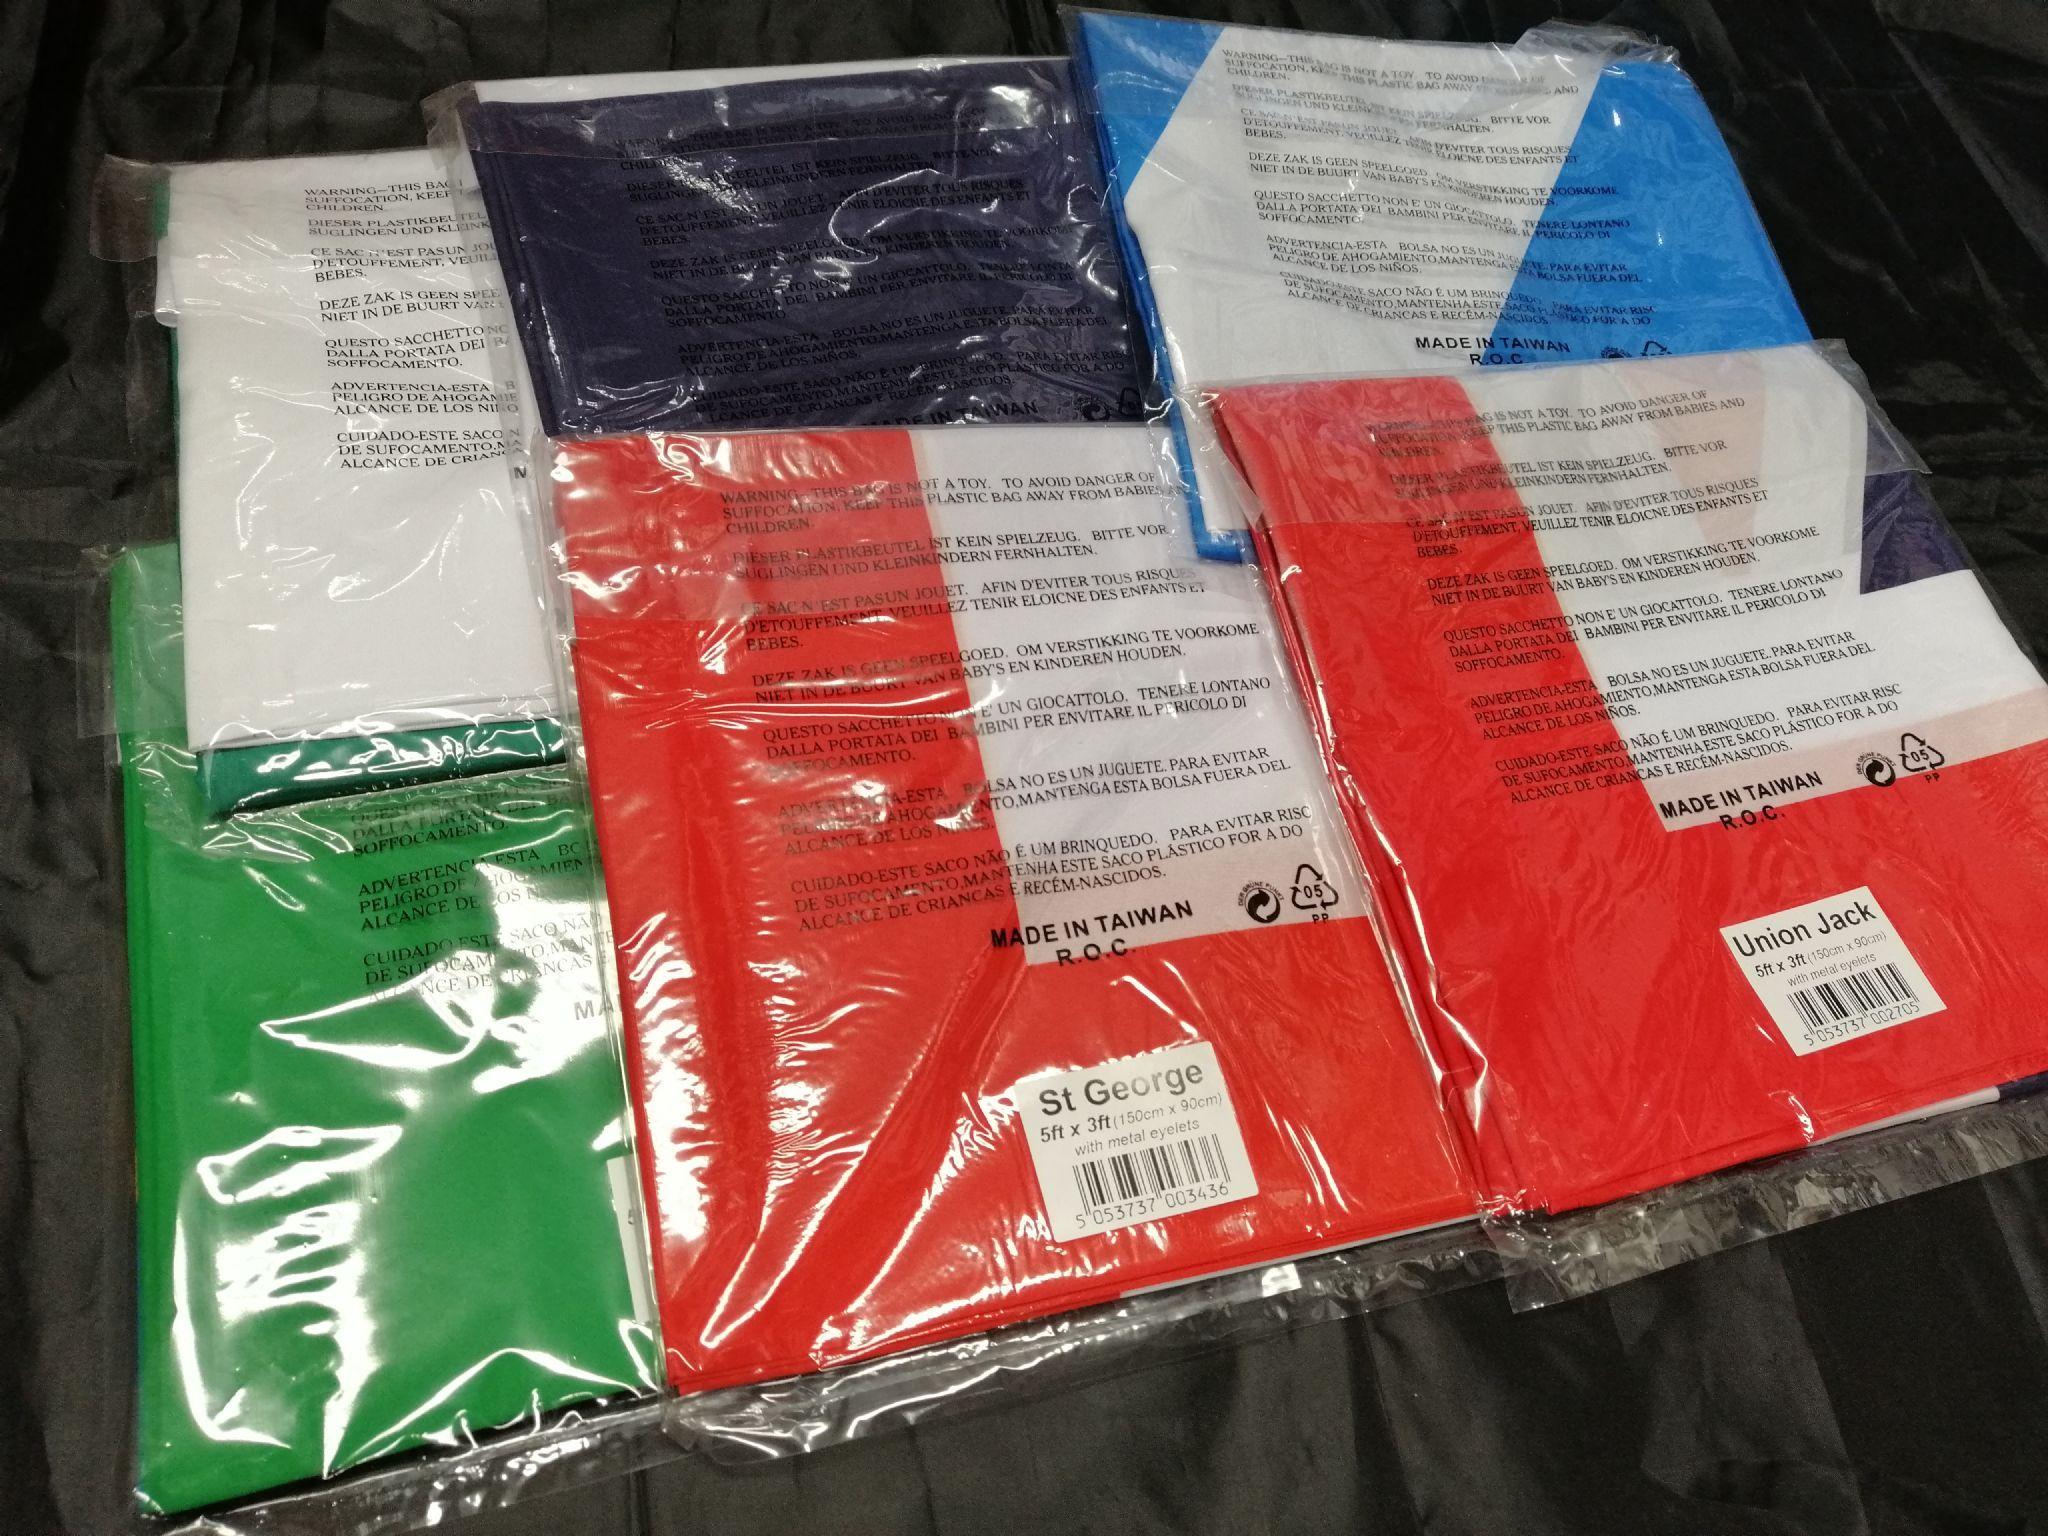 OKTOBERFEST 5ft X 3ft Flag 75denier with eyelets suitable for Flagpoles